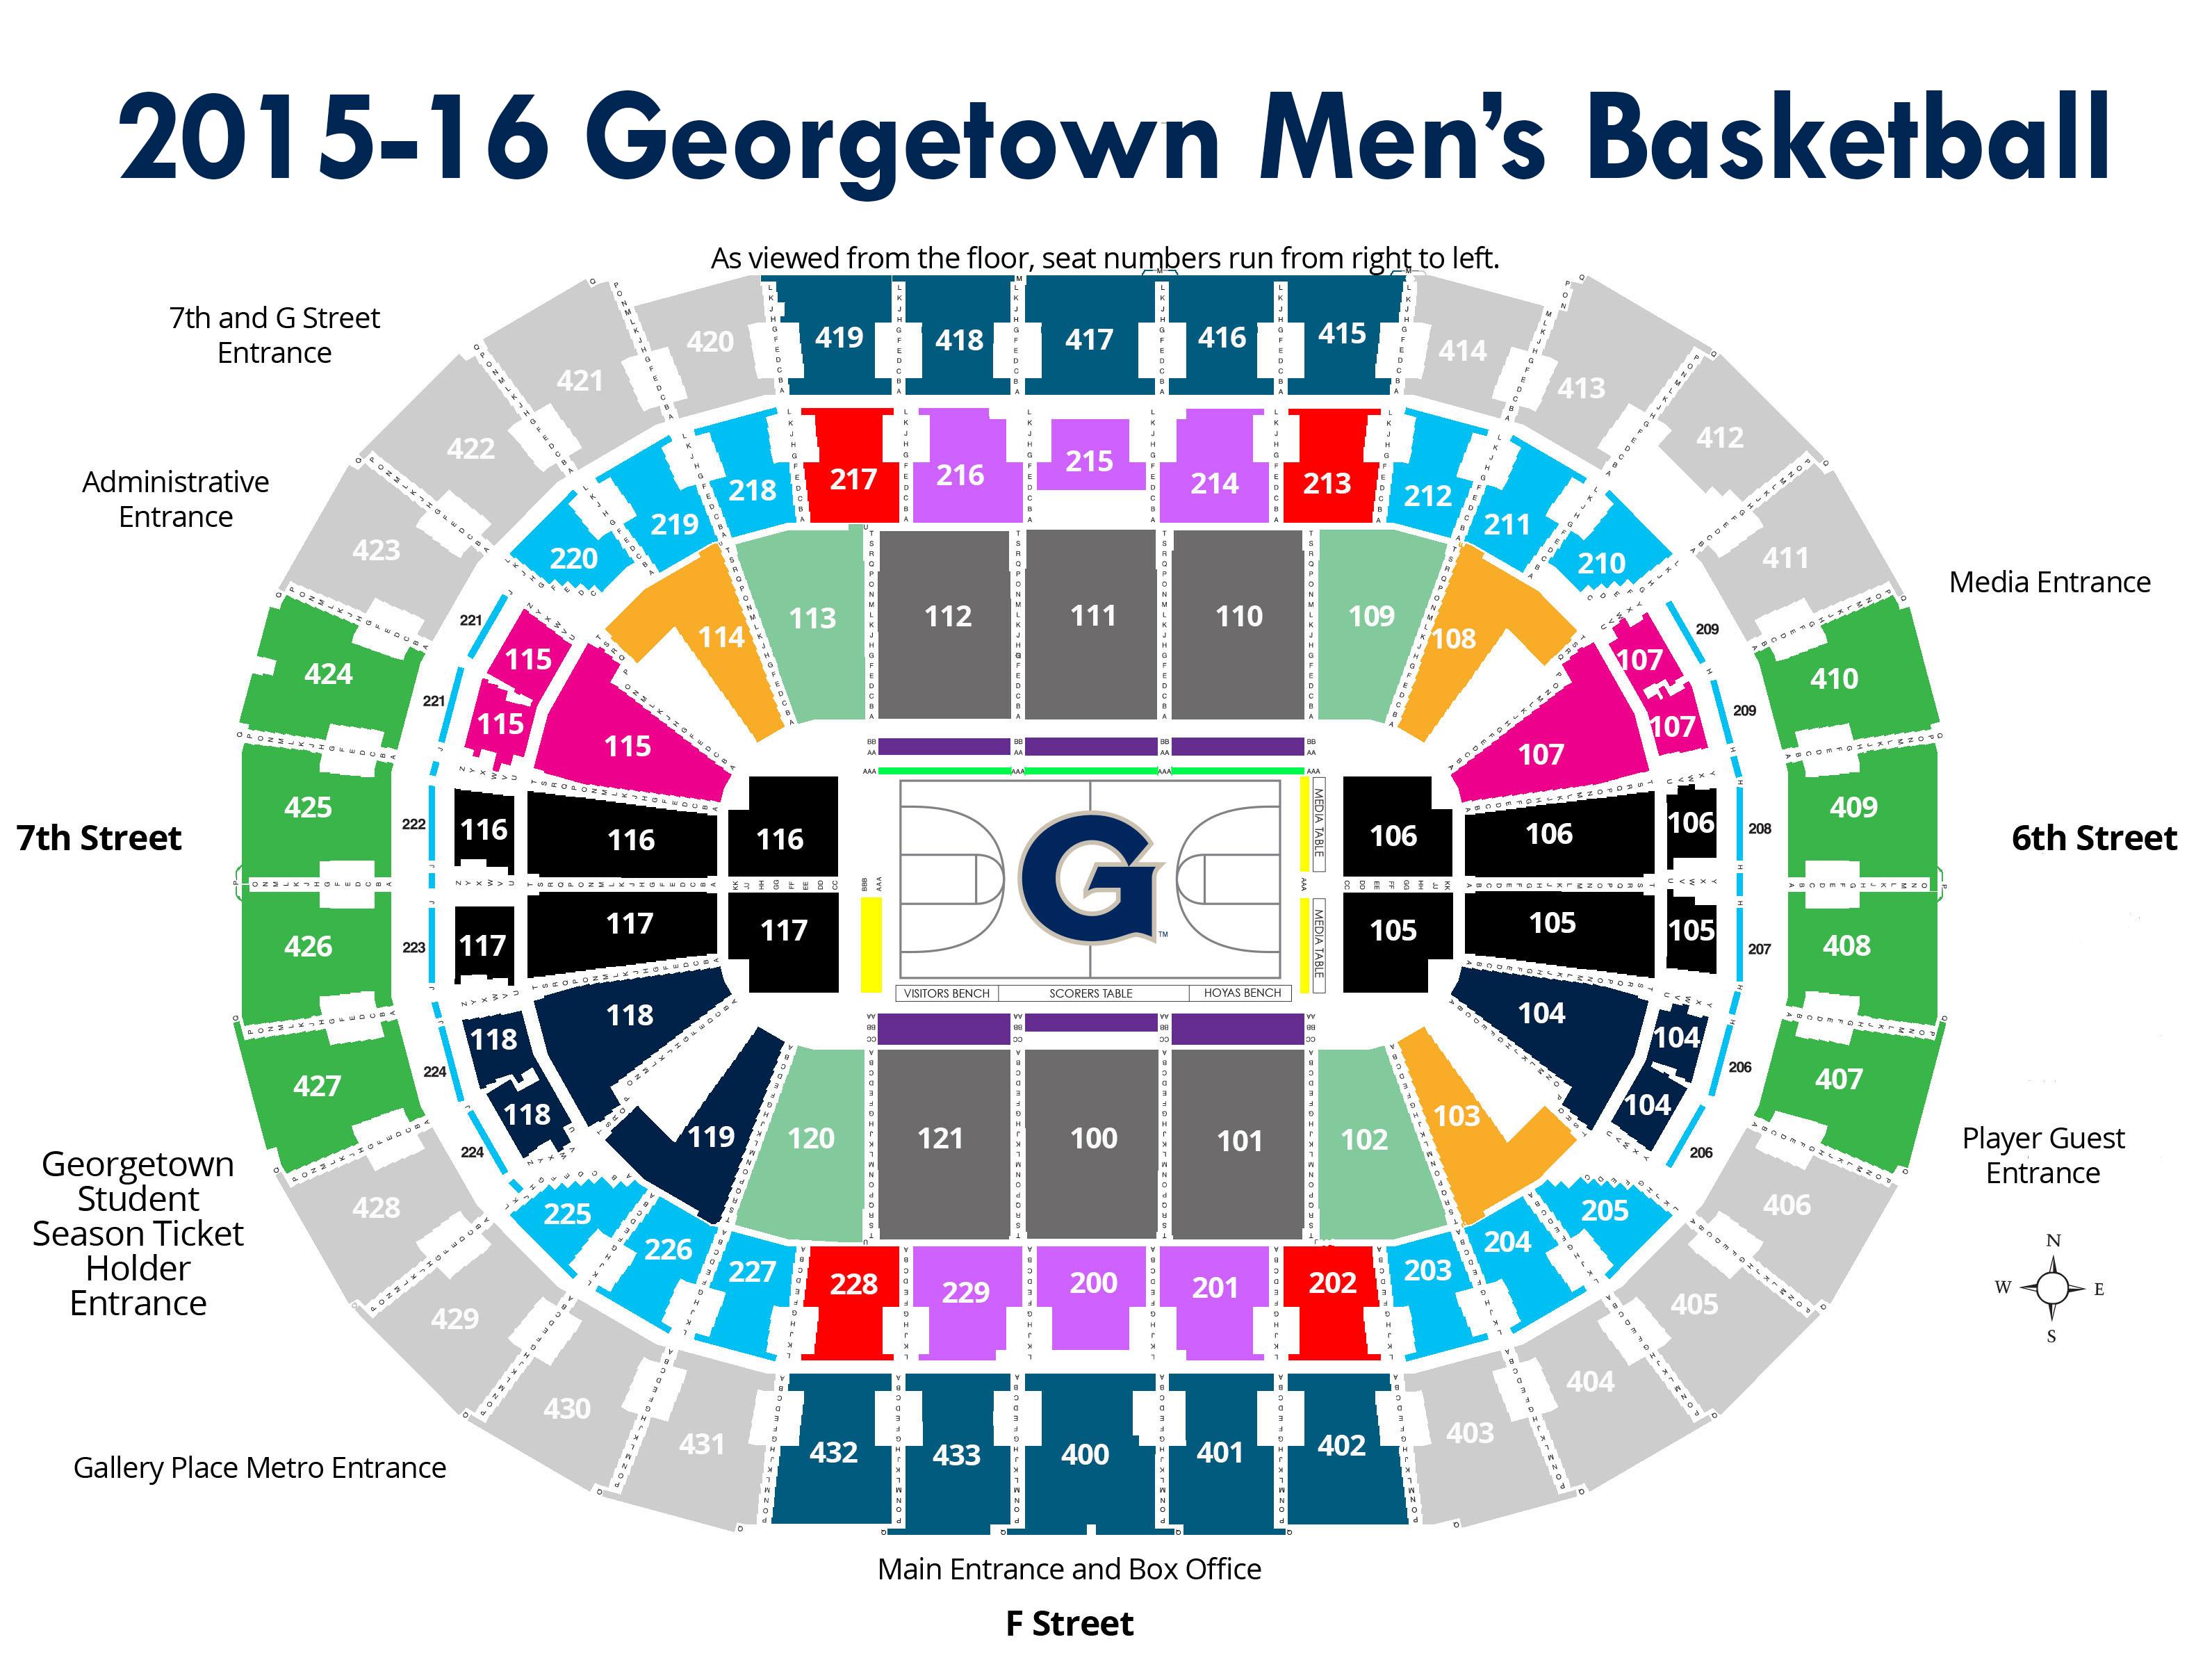 2015-16 Georgetown Men's Basketball - Map of Verizon Center